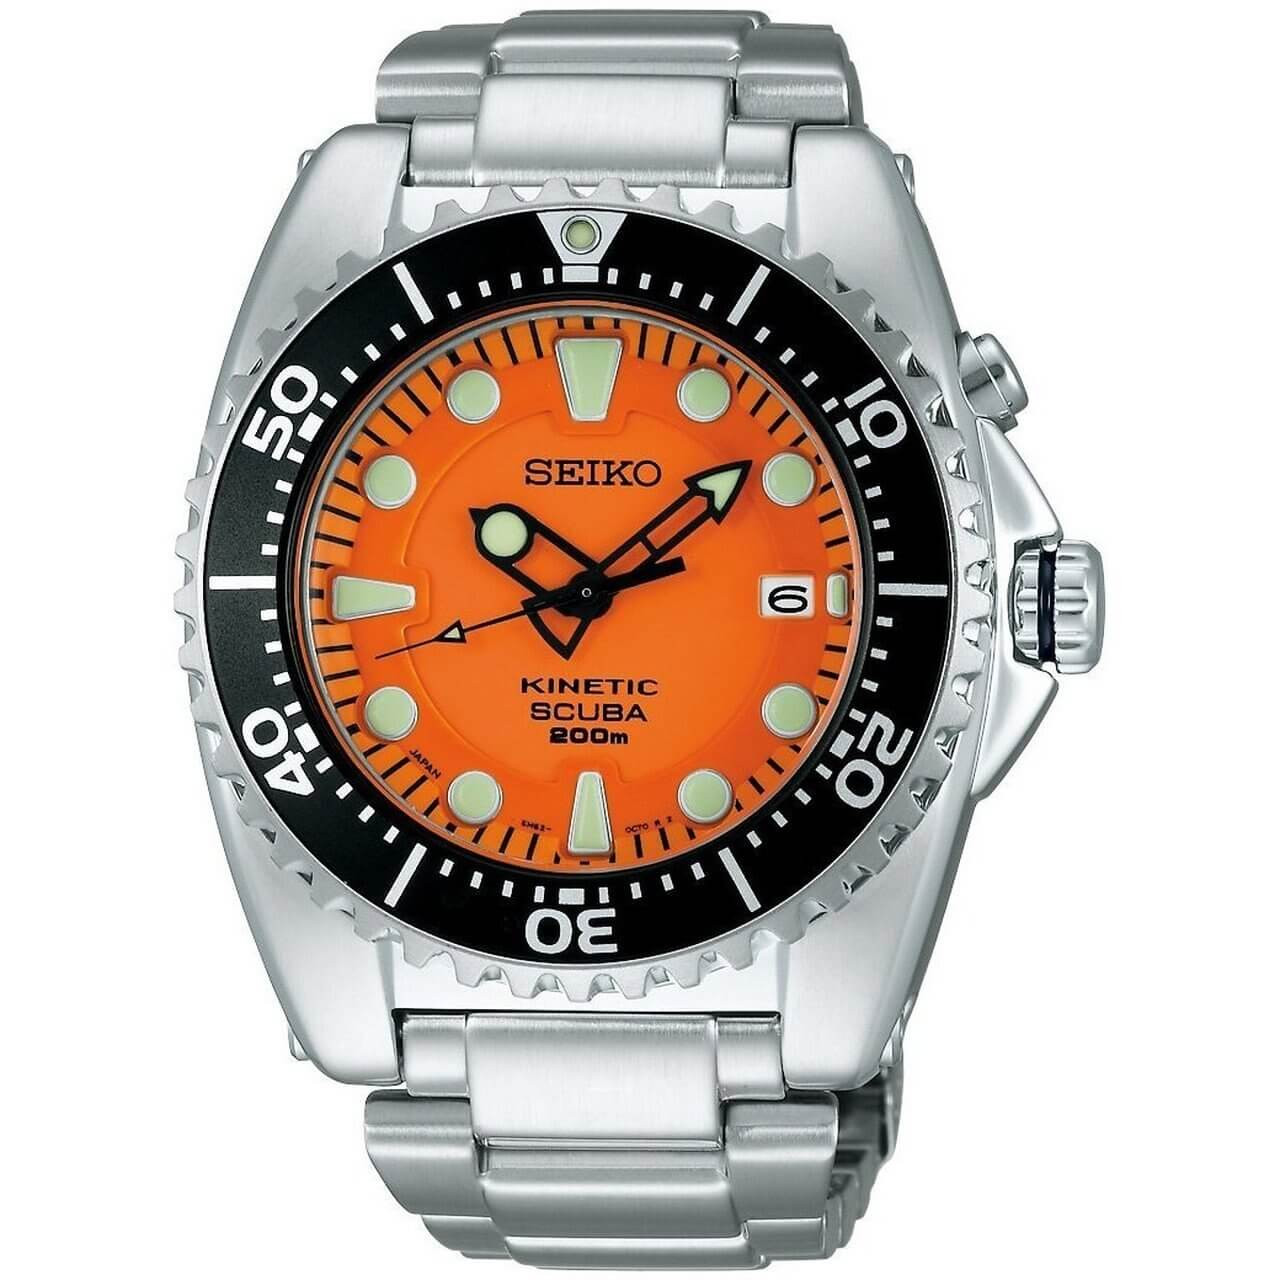 Seiko Prospex Diver Scuba SBCZ015 Orange Kinetic